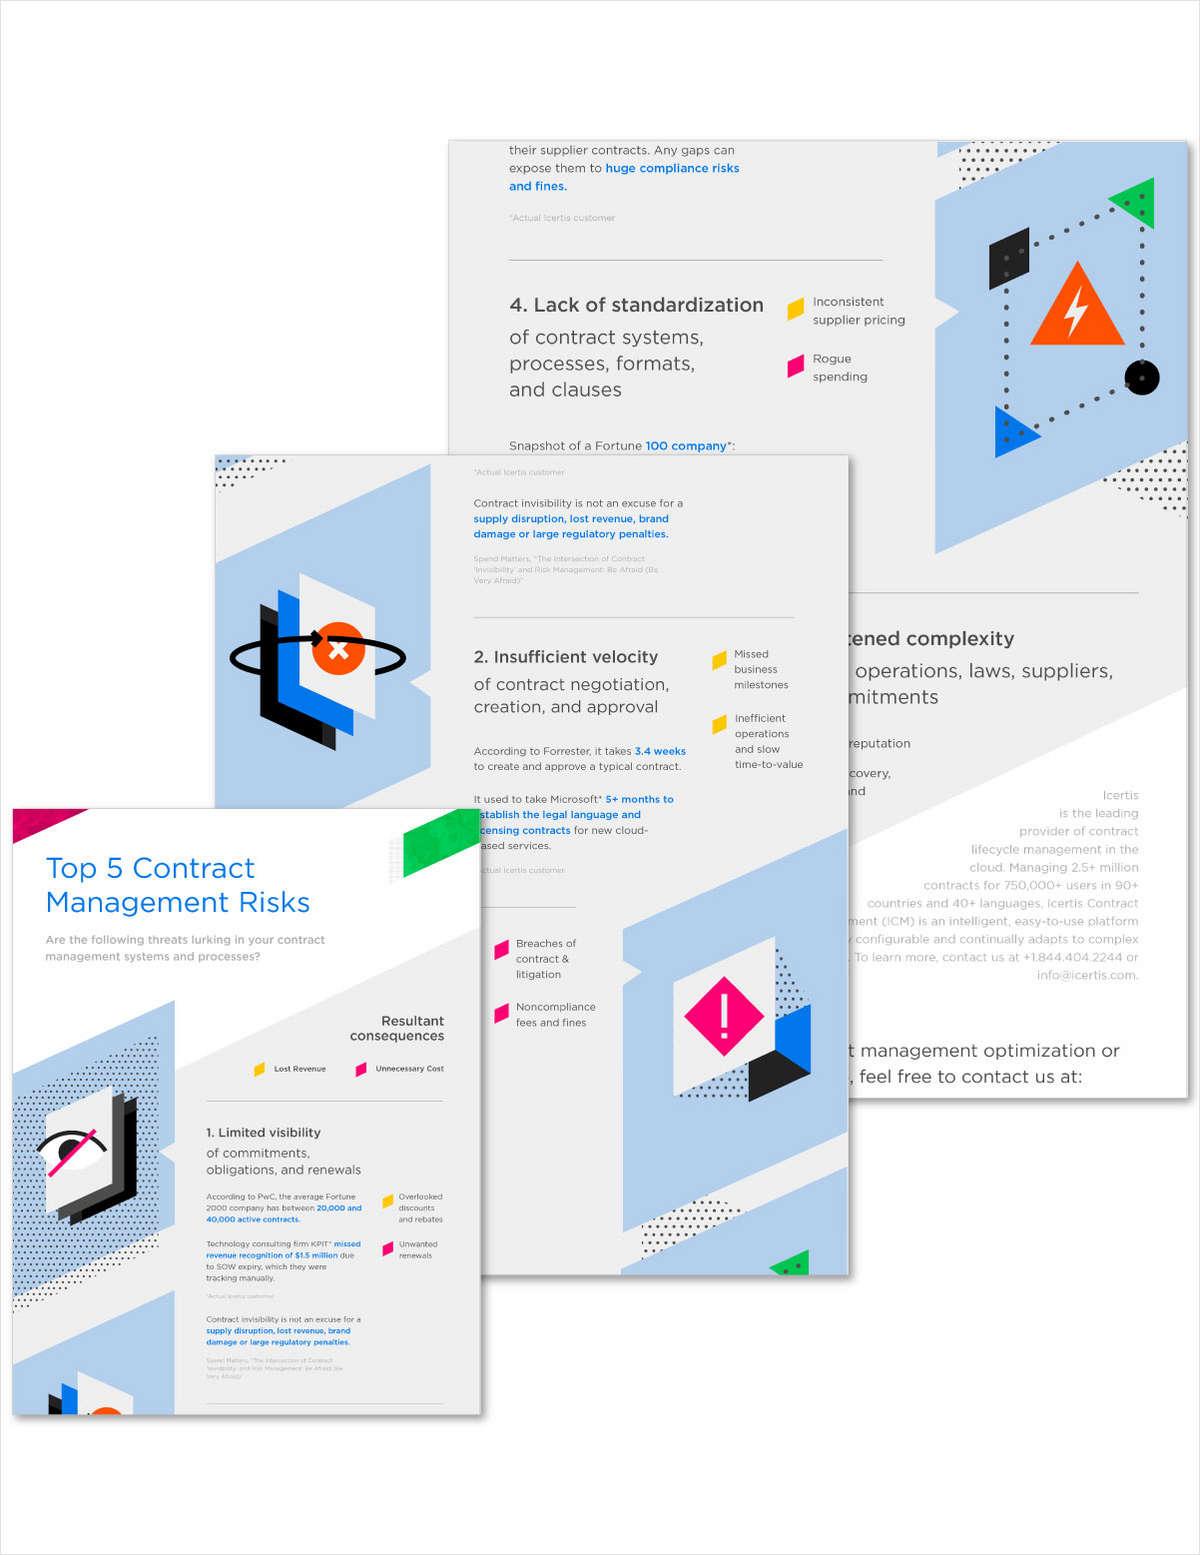 Top 5 Contract Management Risks